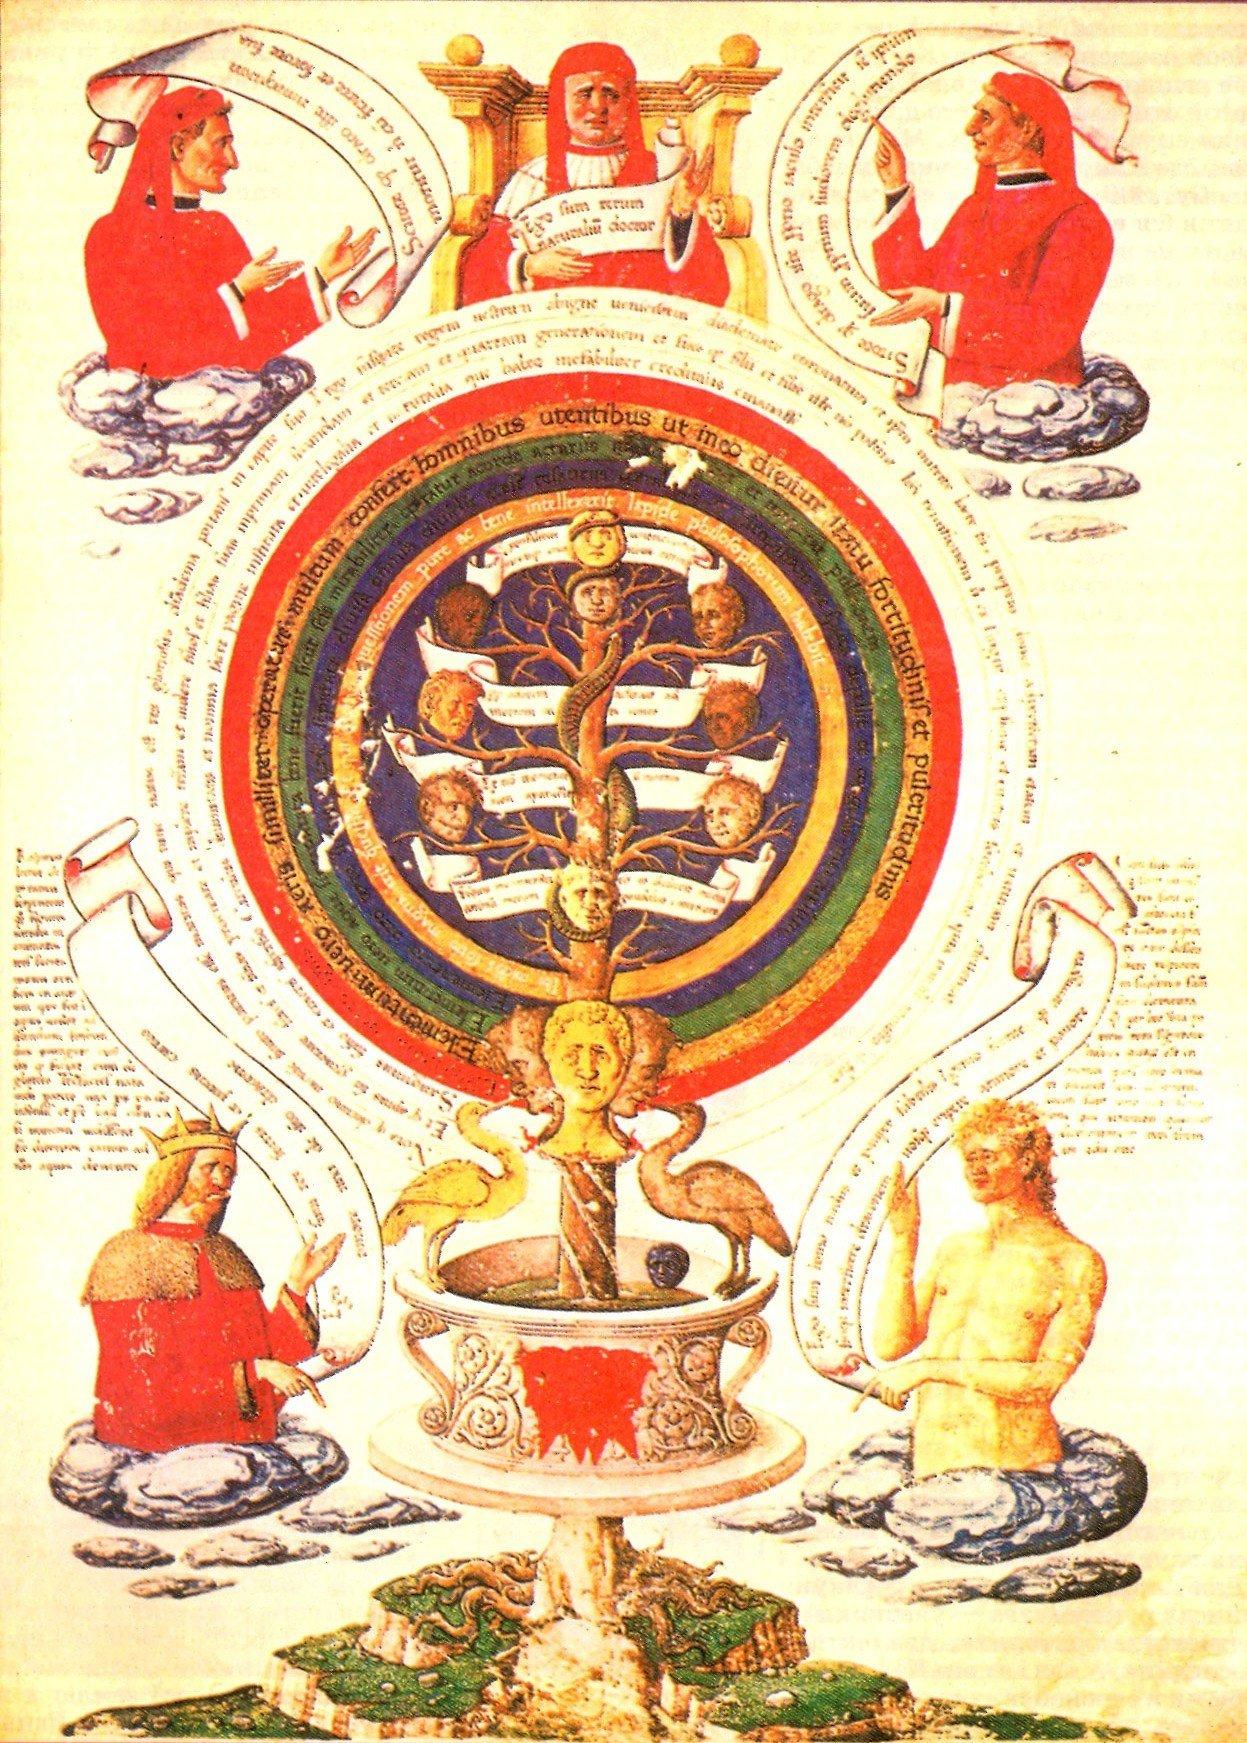 3 claves de la alquimia espiritual